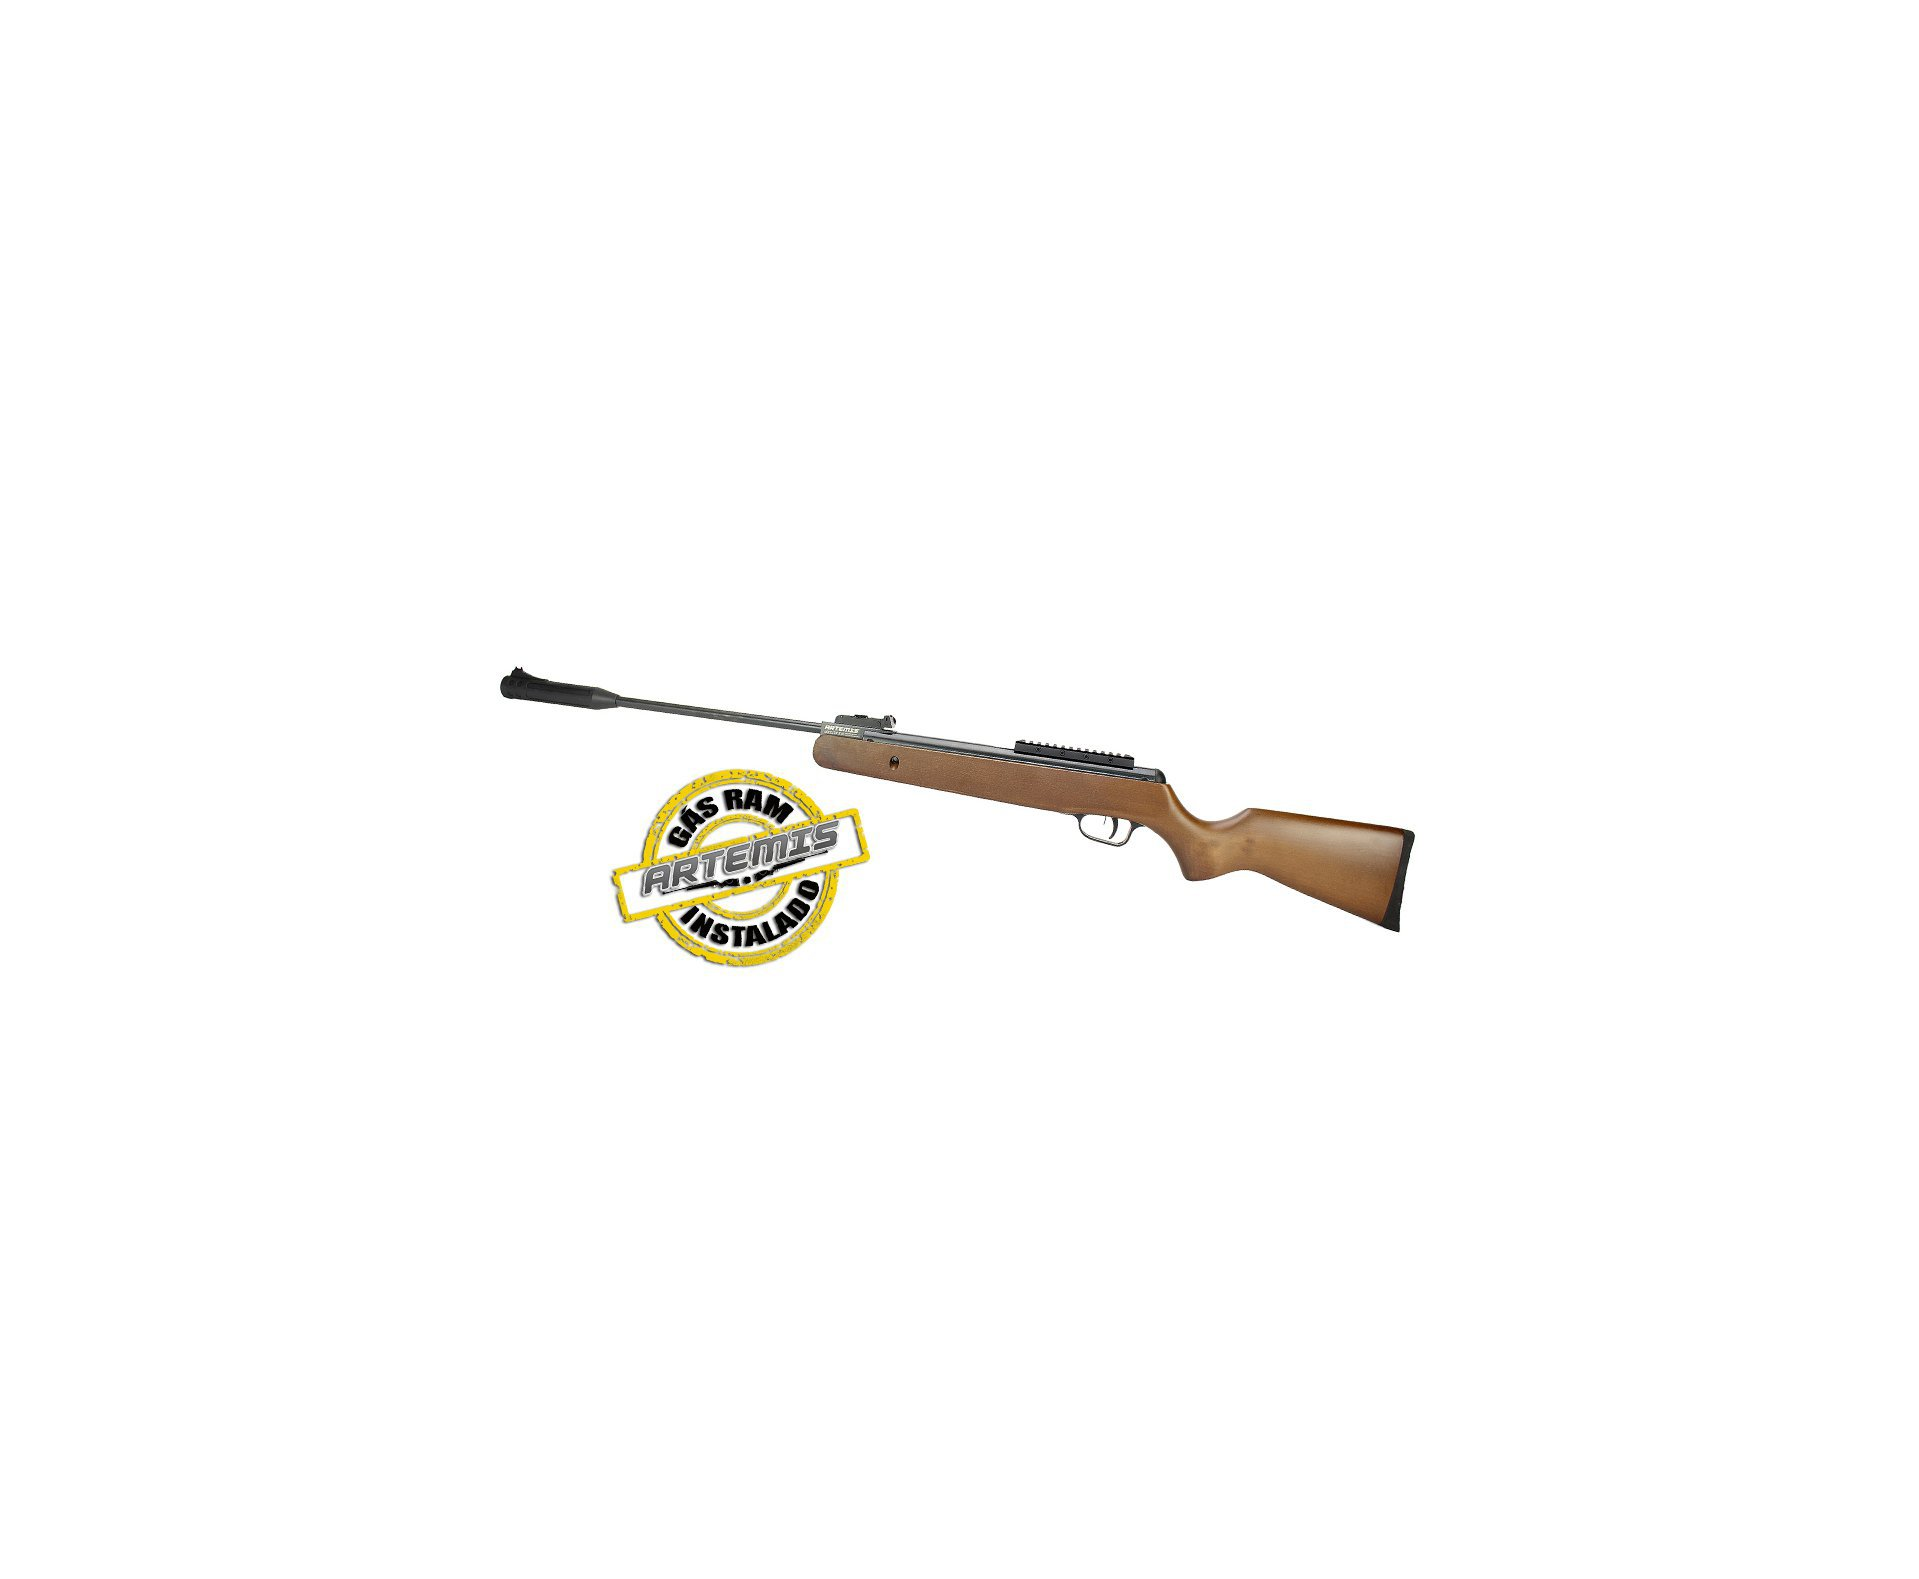 Carabina De Pressão Black Hawk Wood Edition Gas Ram 70kg 5.5mm Artemis + Luneta + Capa + 2 Chumbinho